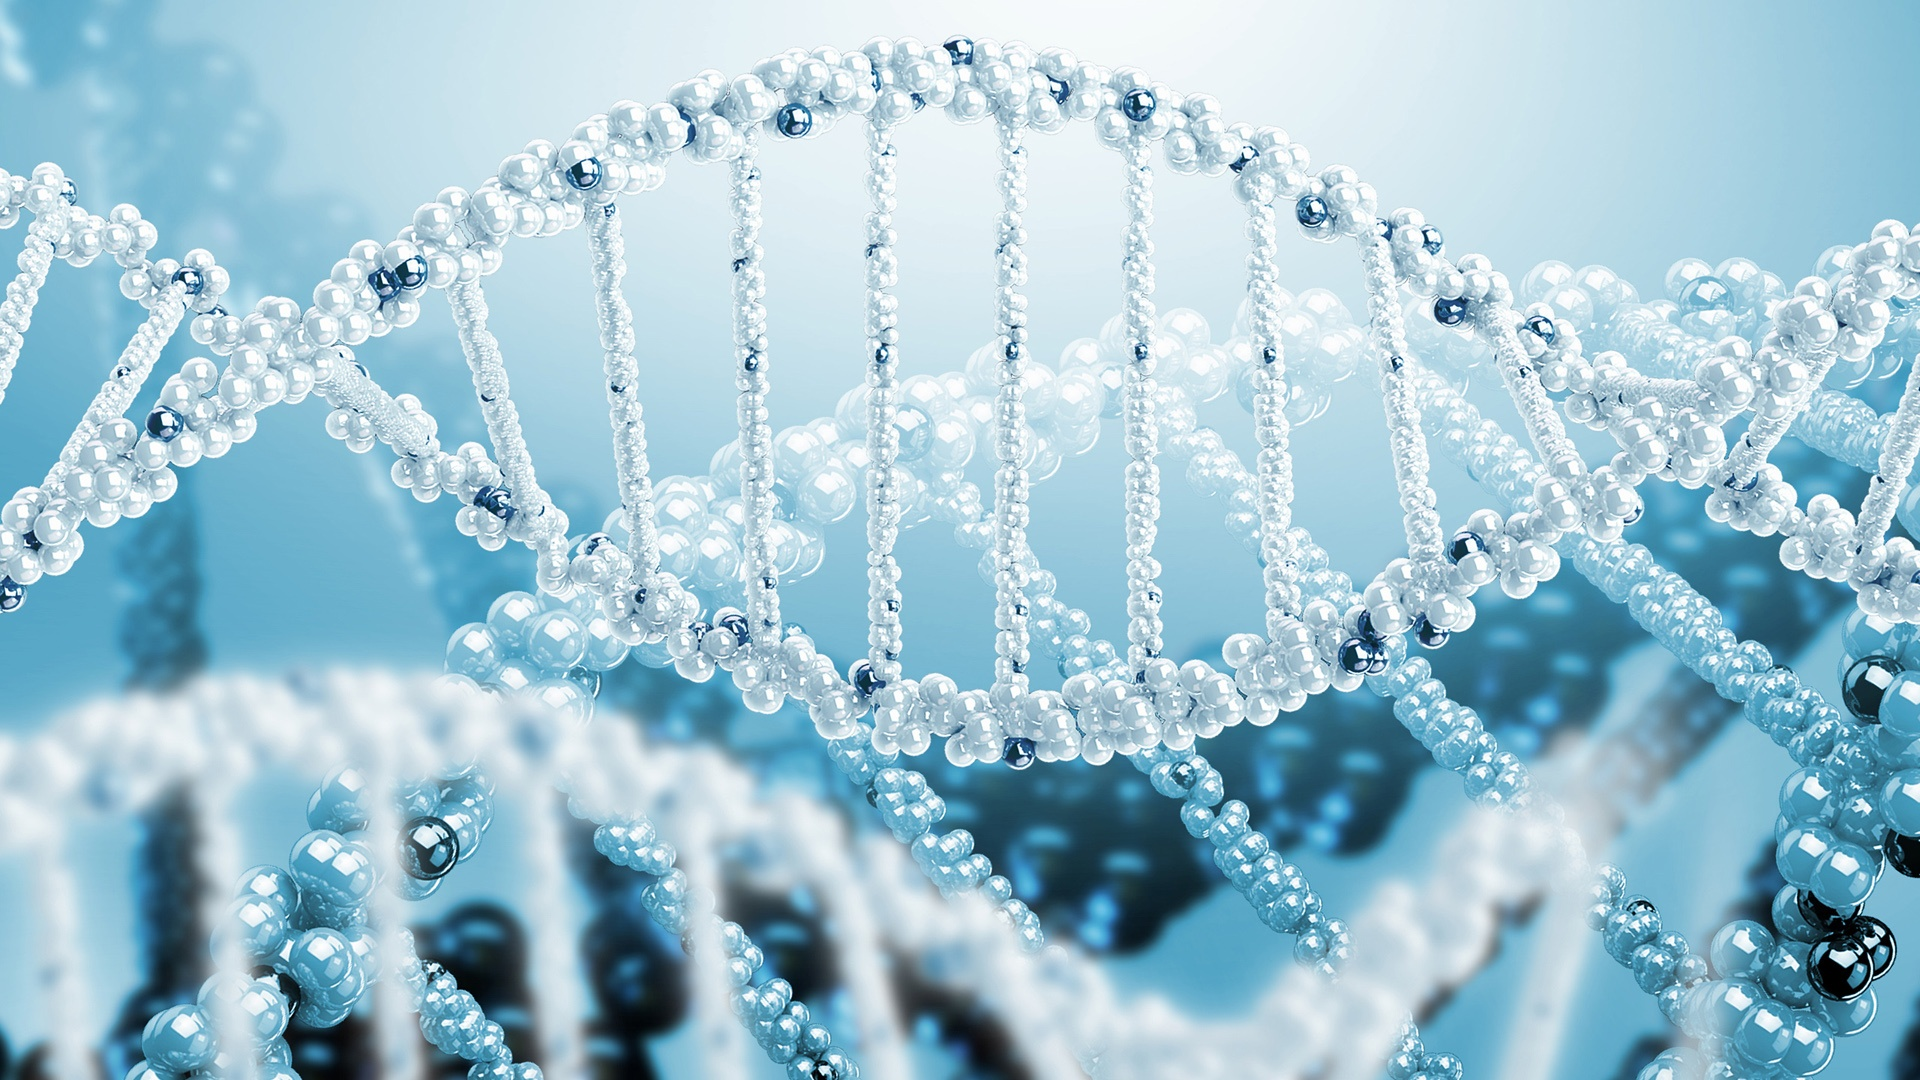 3D 렌더링 과학 DNA의 나선형 배경 화면  1920x1080 풀